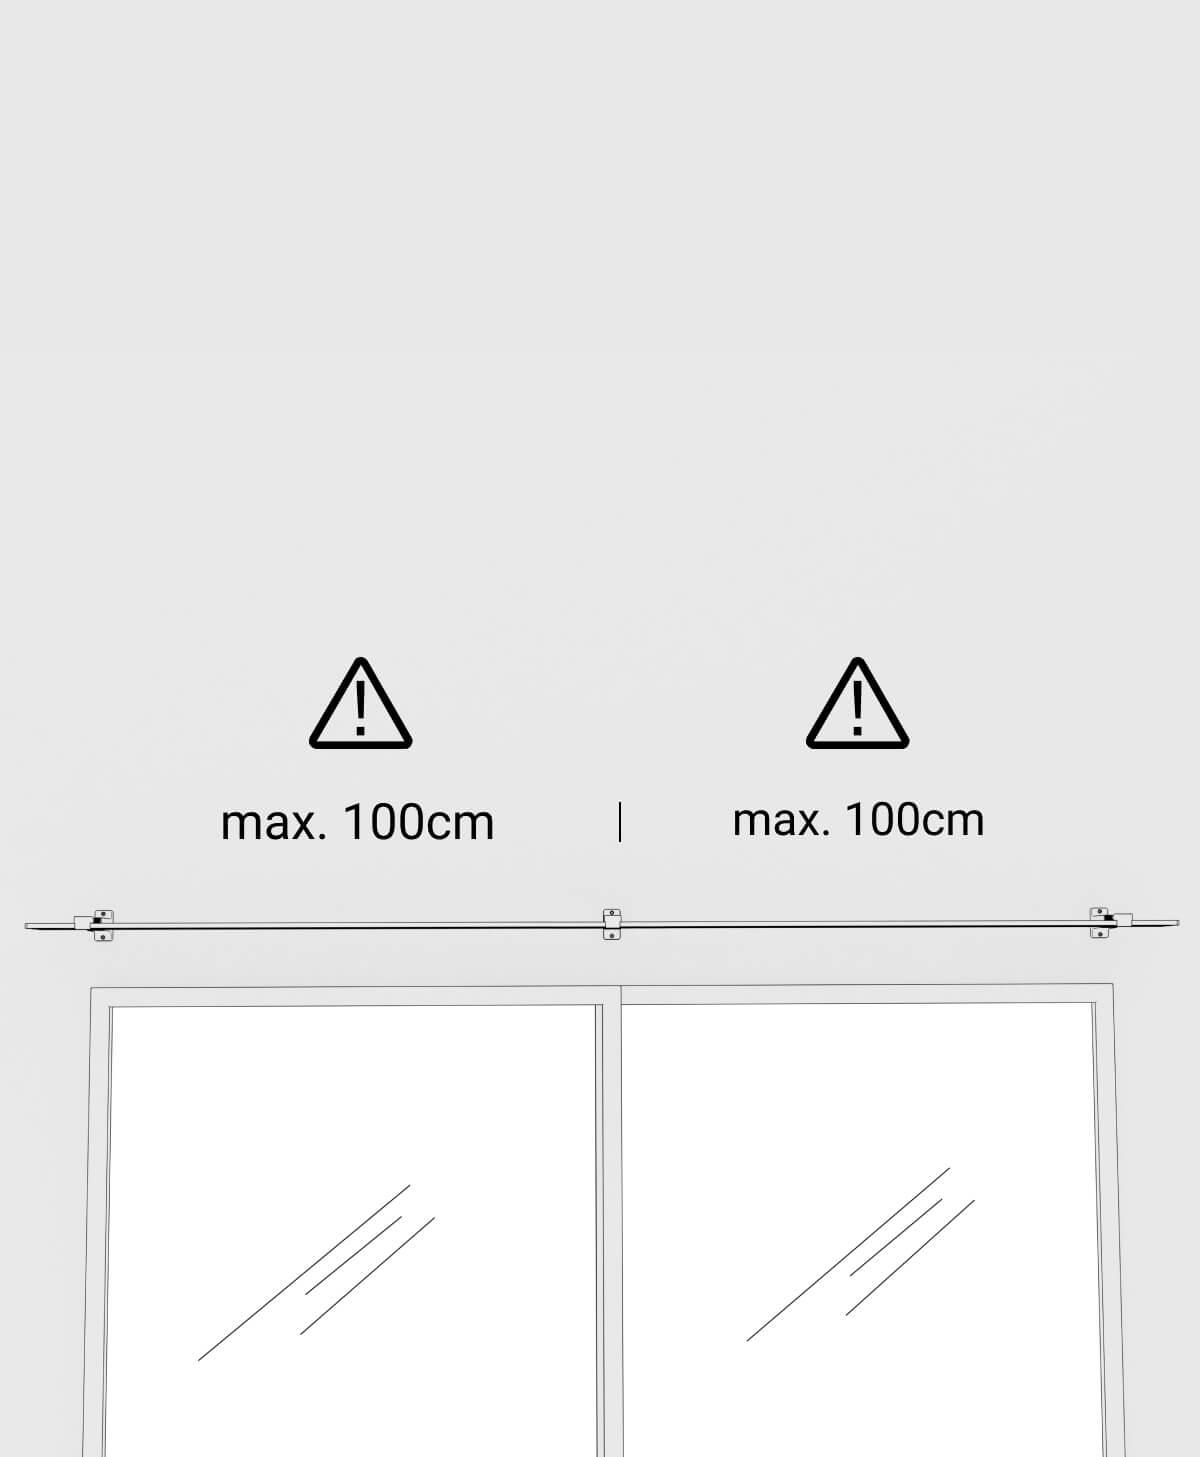 Slimflex ayarlanabilir L ayak 4